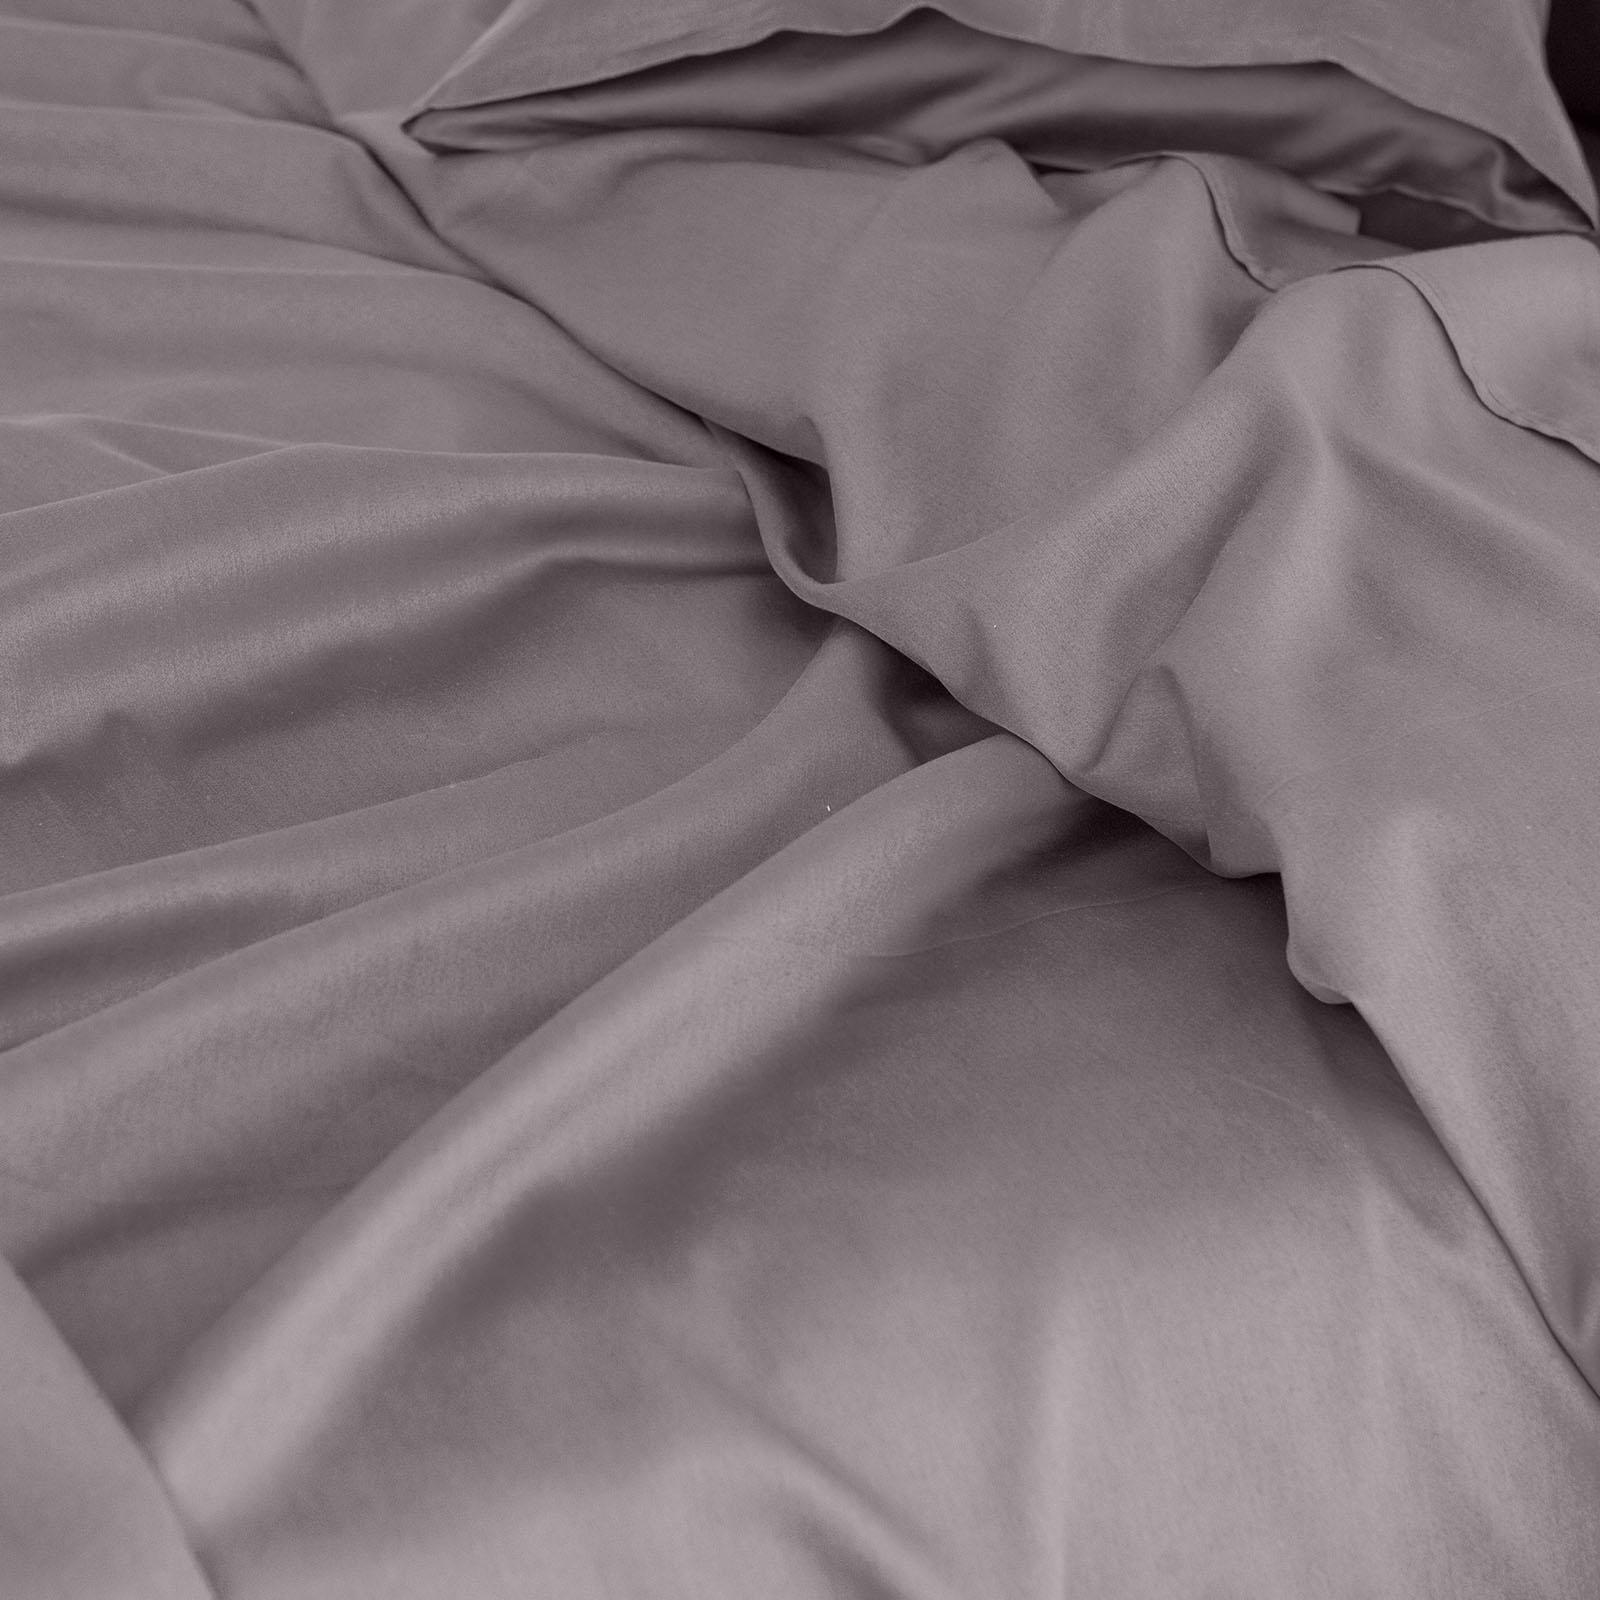 thumbnail 51 - Royal Comfort 1000TC Hotel Grade Bamboo Cotton Sheets Pillowcases Set Ultrasoft